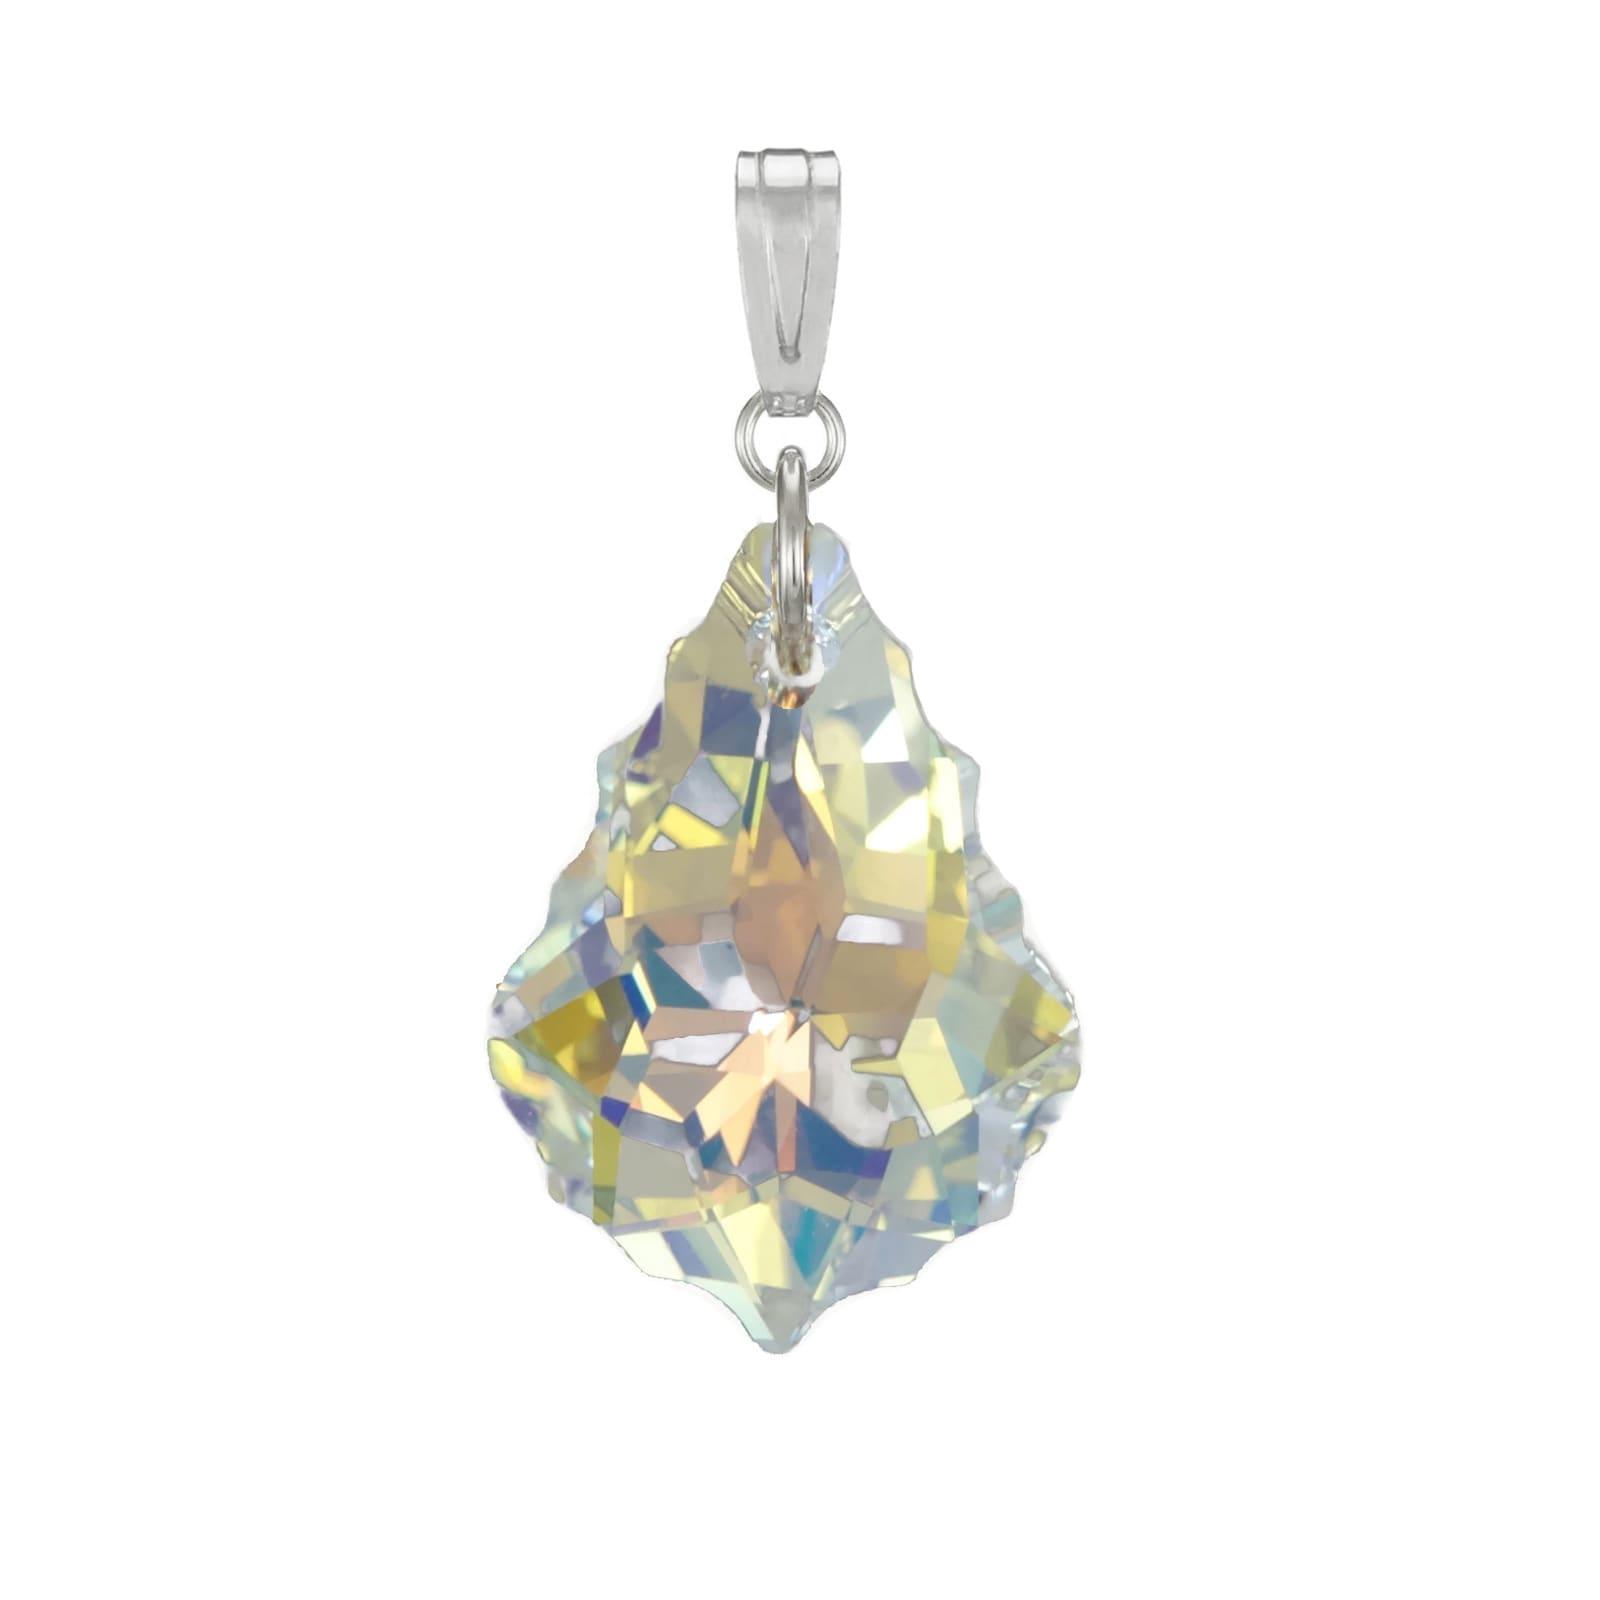 3becab0cc Handmade Jewelry by Dawn Aurora Borealis Swarovski Crystal Baroque Sterling  Silver Pendant (USA)